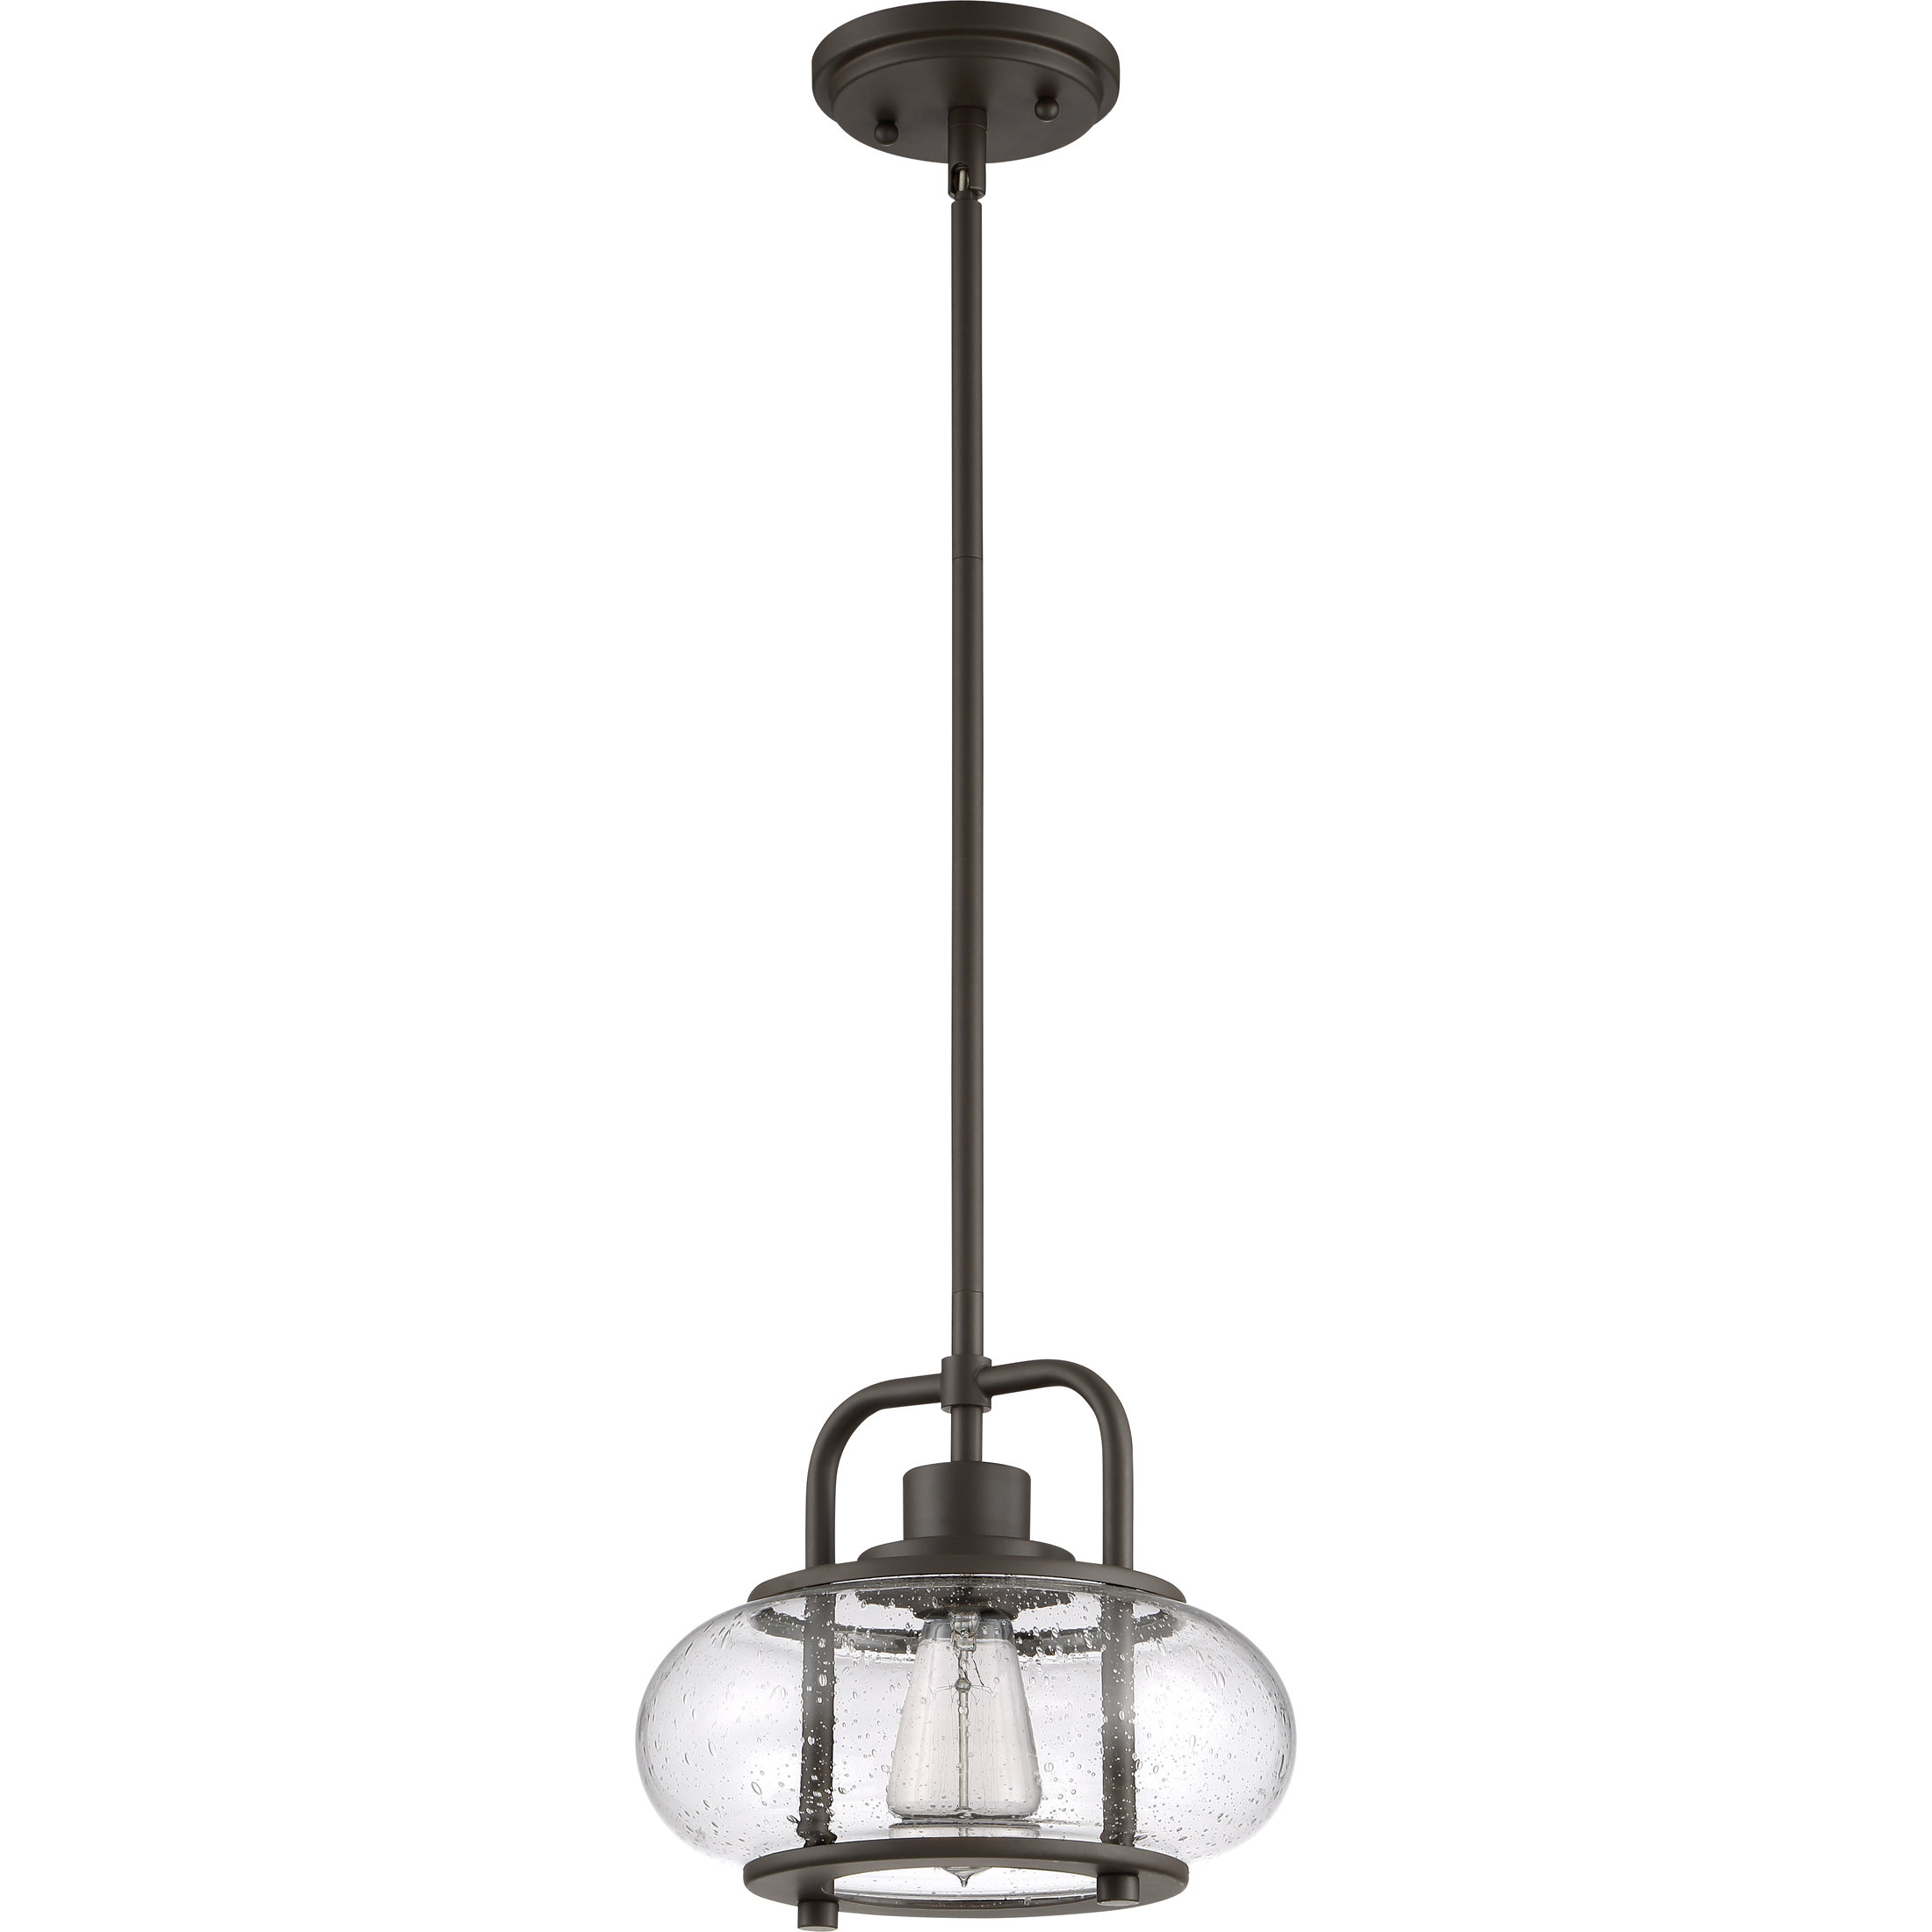 Popular Braxton 1 Light Single Schoolhouse Pendant Pertaining To Erico 1 Light Single Bell Pendants (View 19 of 25)